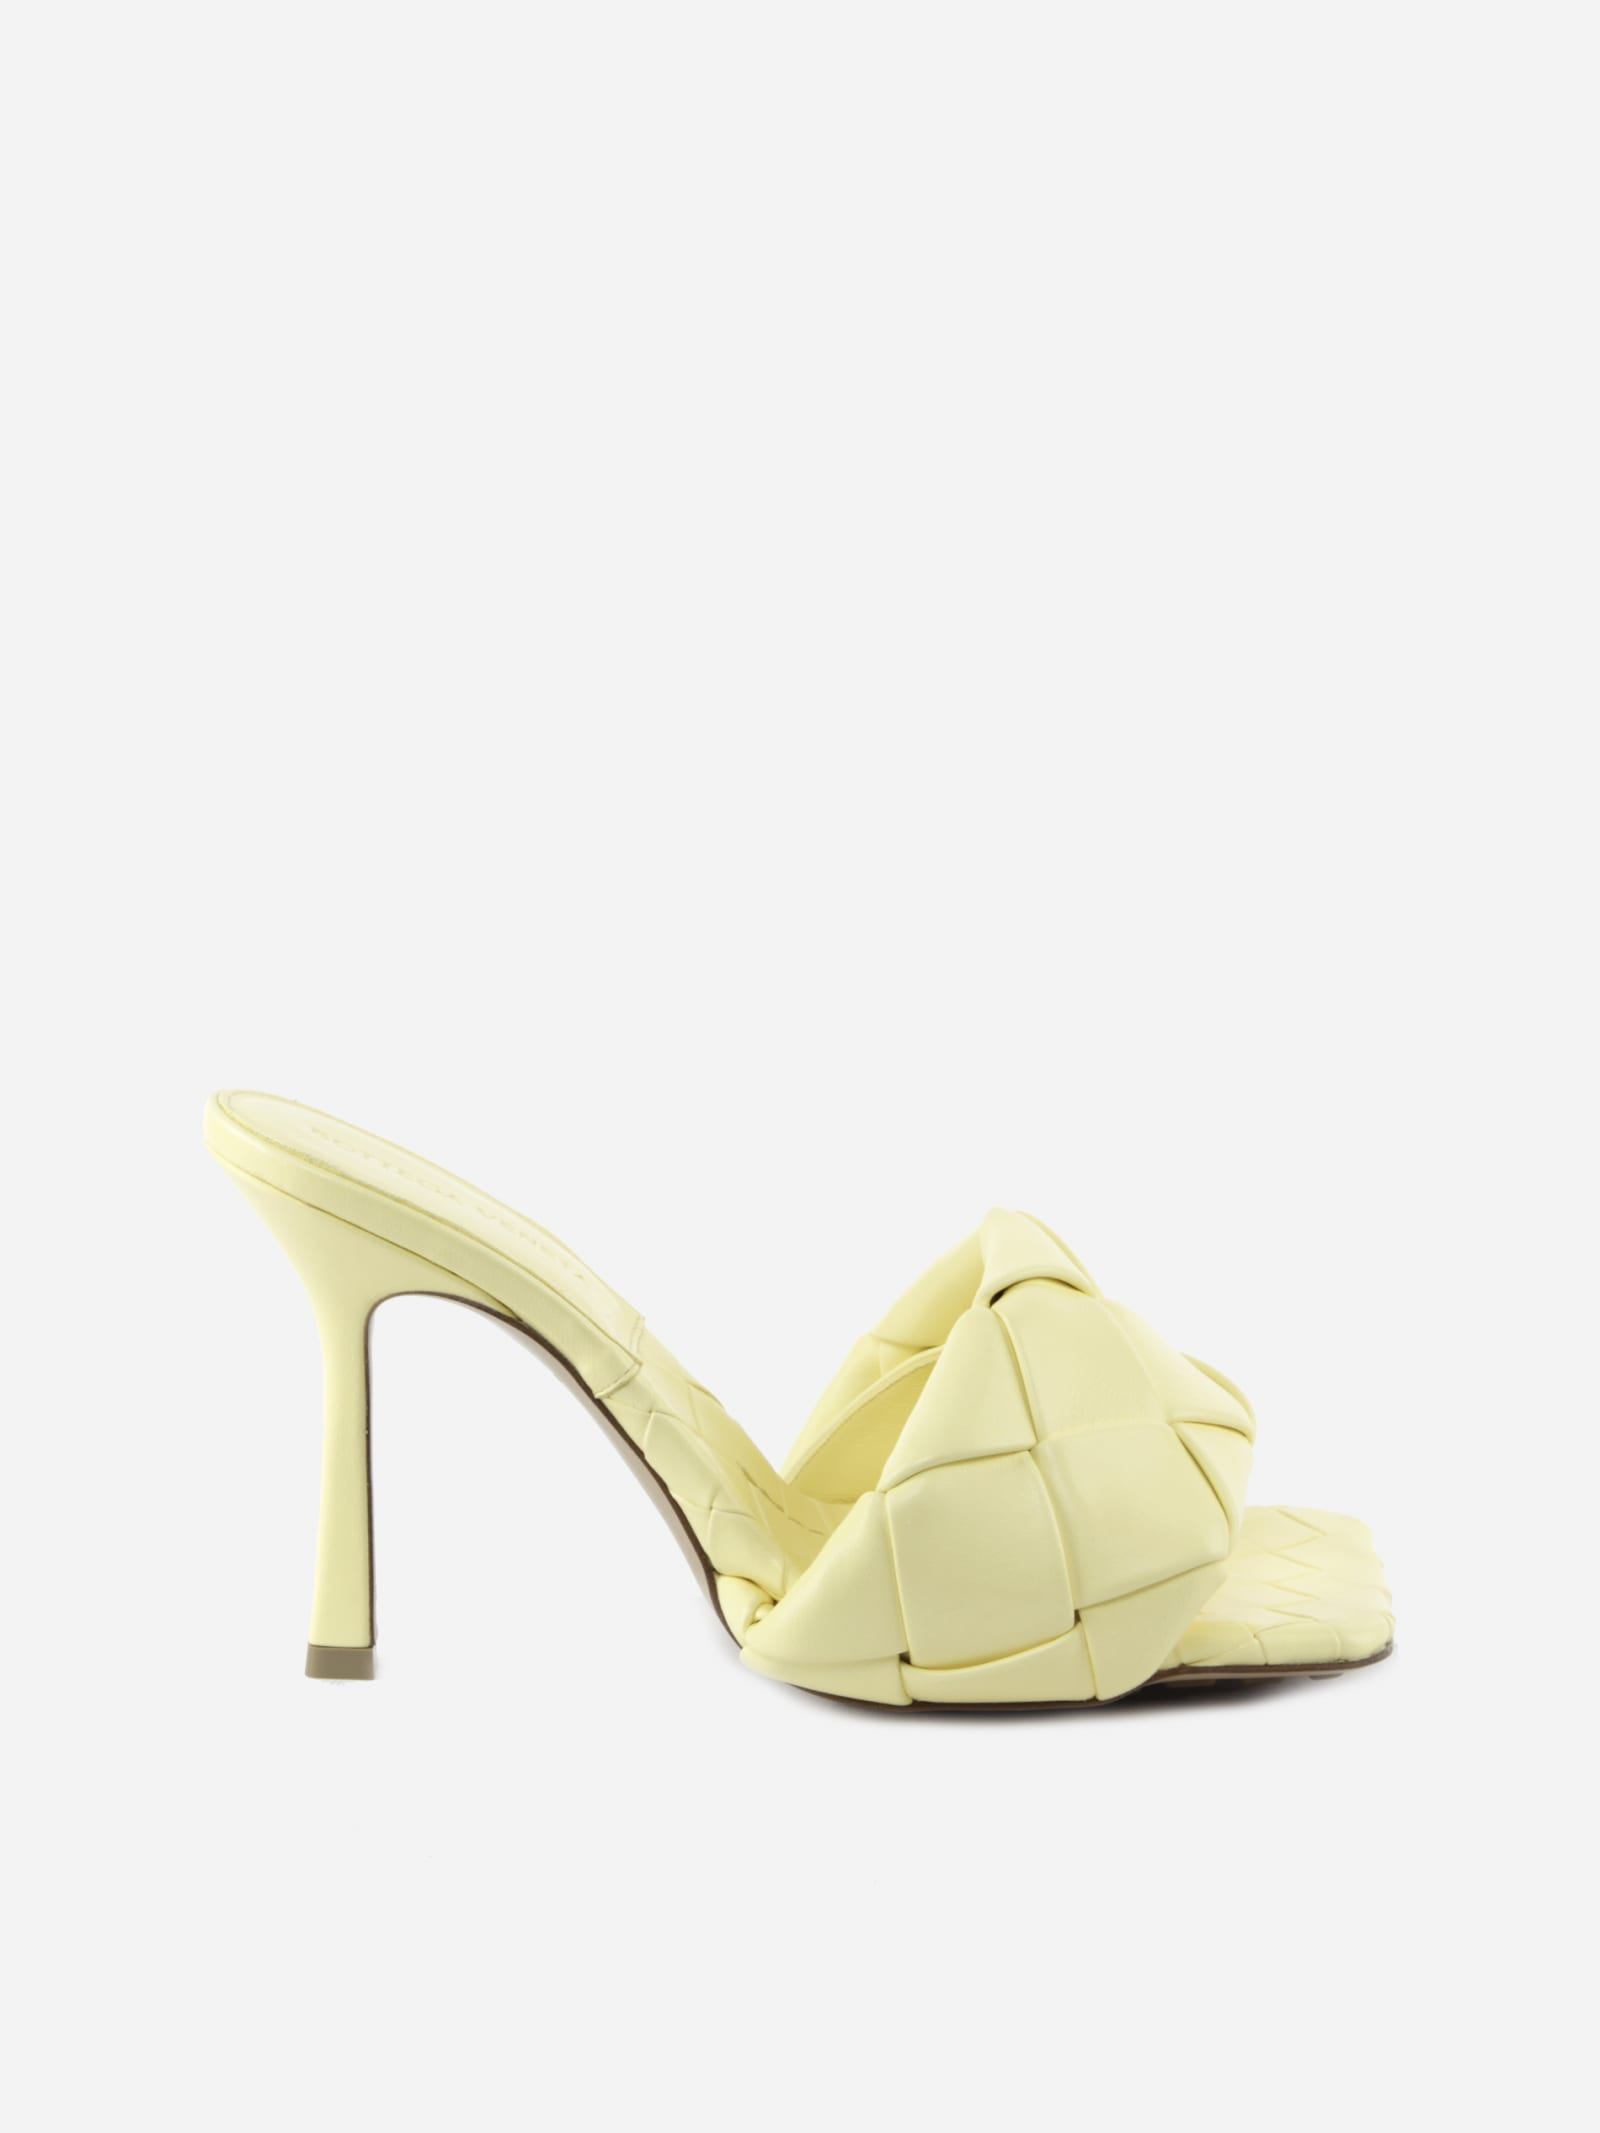 Buy Bottega Veneta Lido Sandals In Leather With Woven Pattern online, shop Bottega Veneta shoes with free shipping